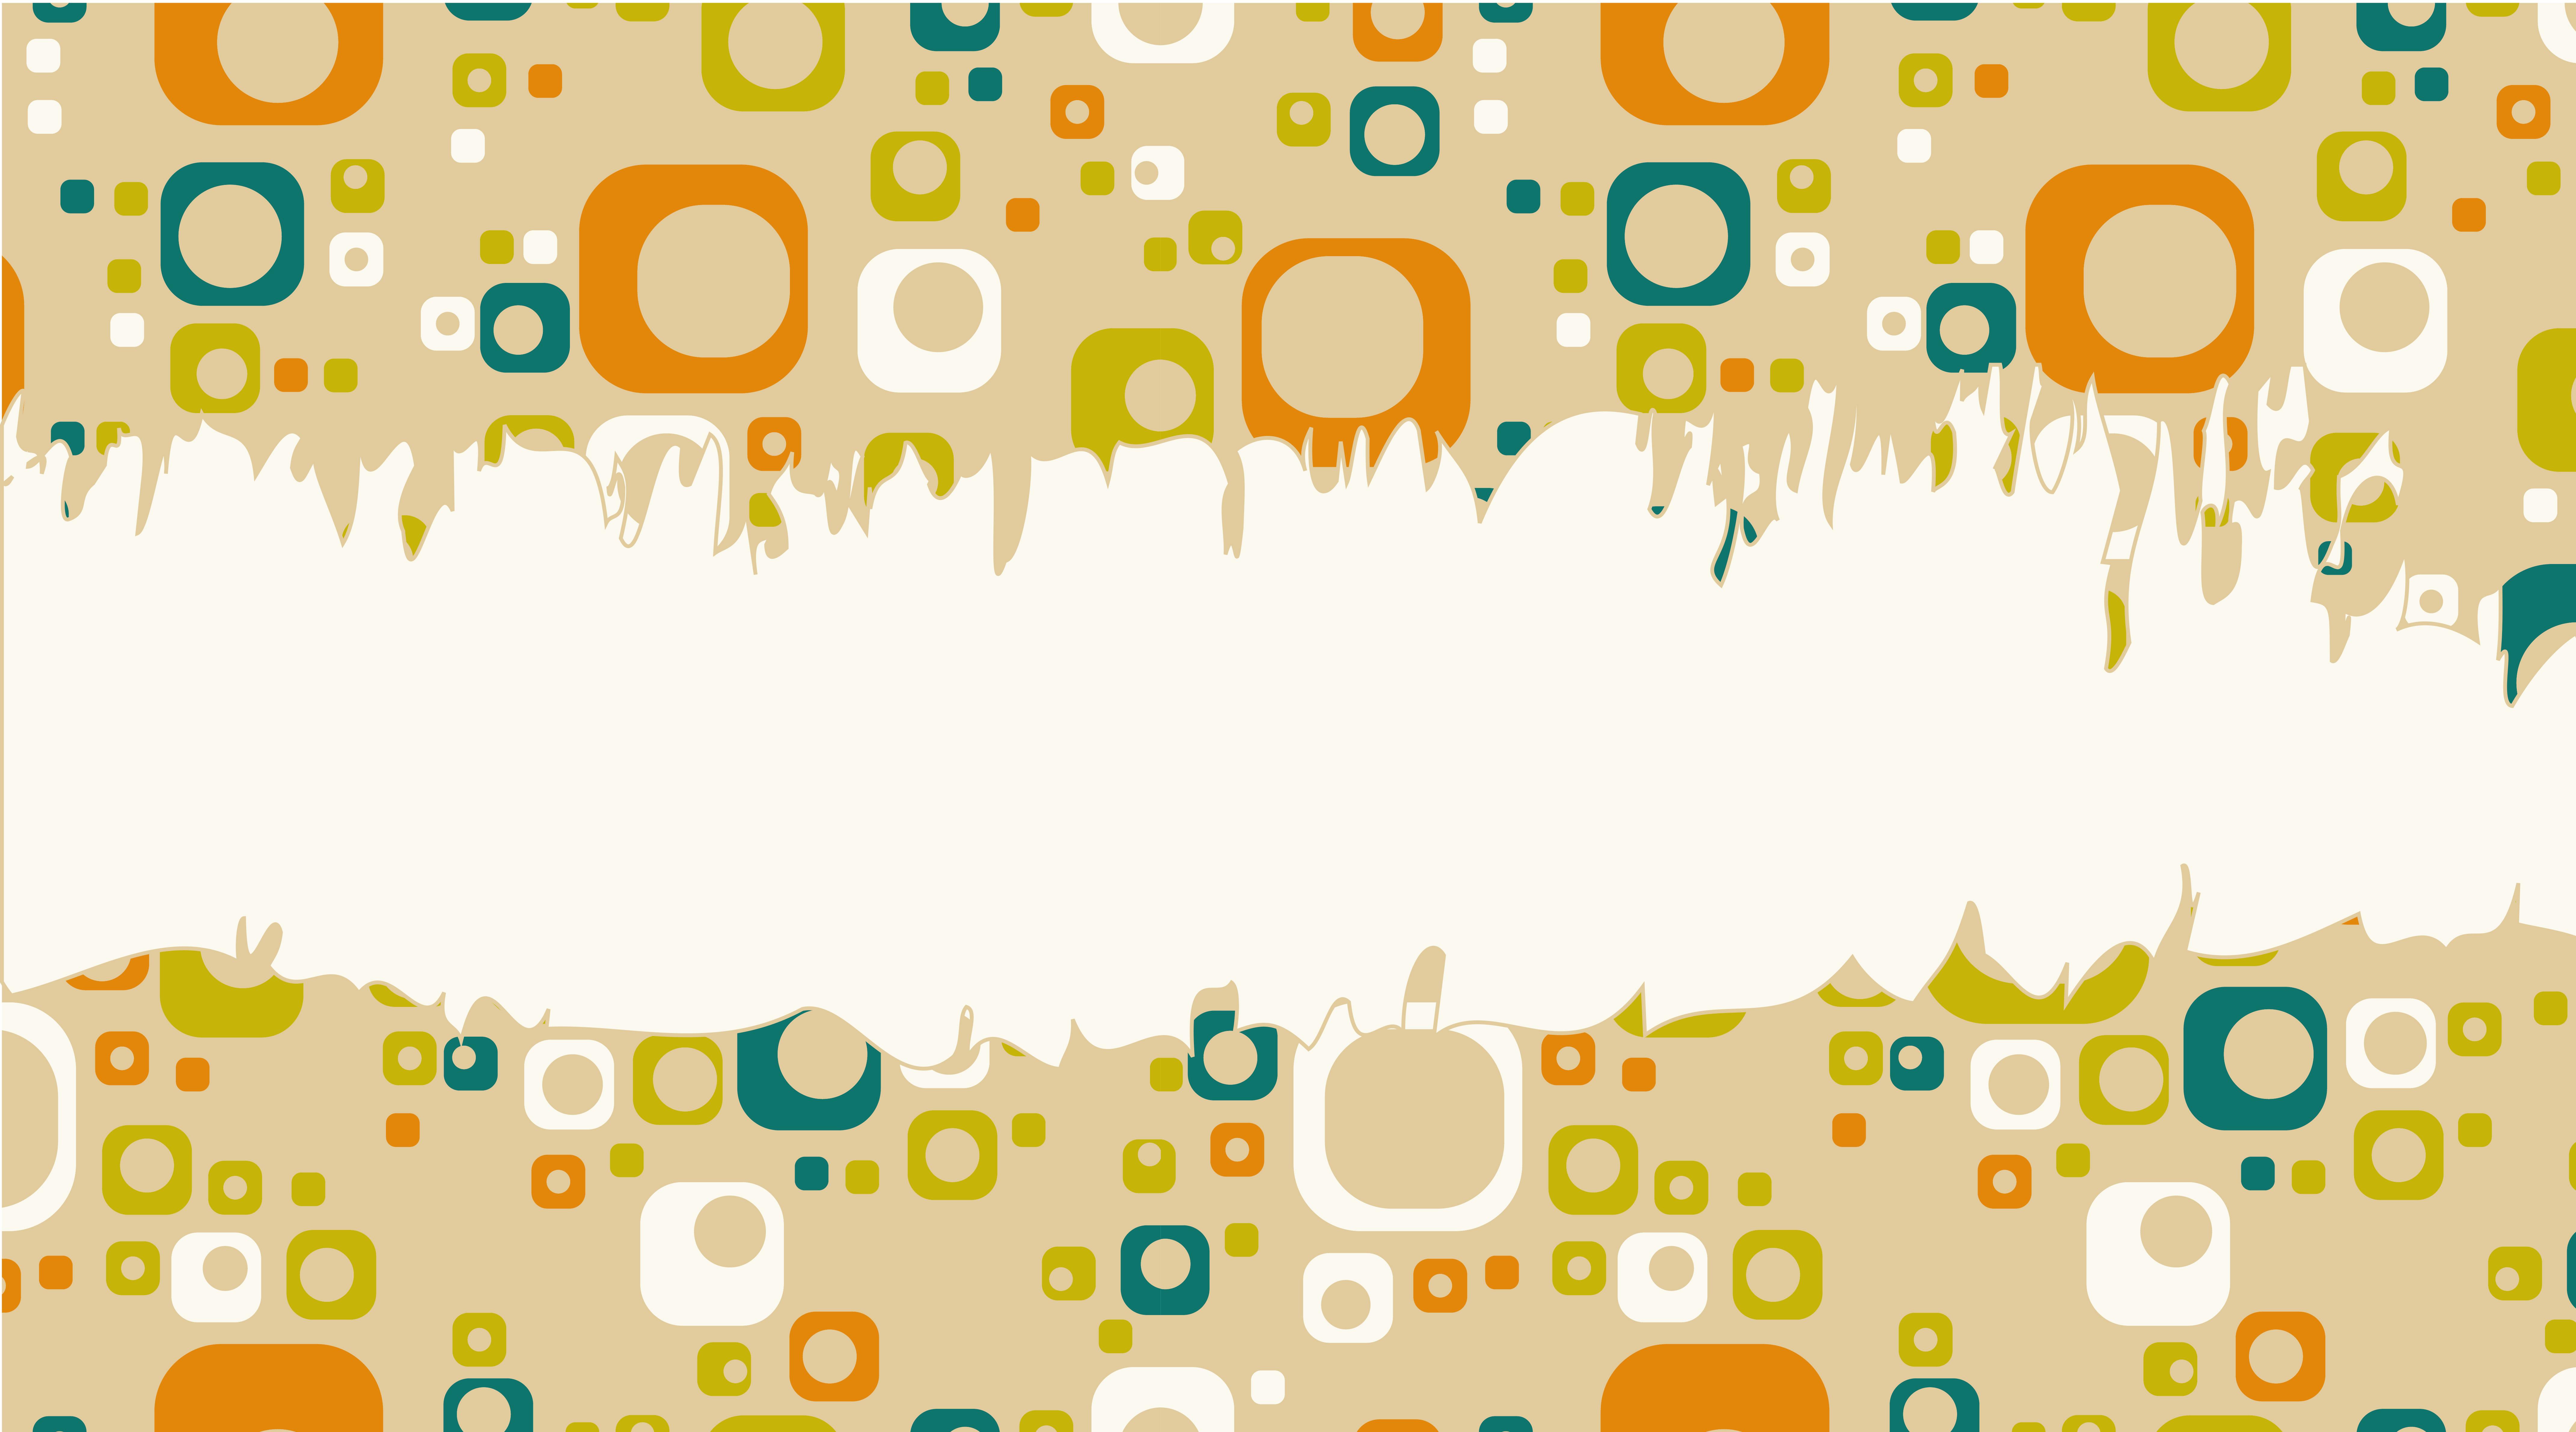 Fondo De Fiesta Diseño Decoracion Confeti Arte Patrón